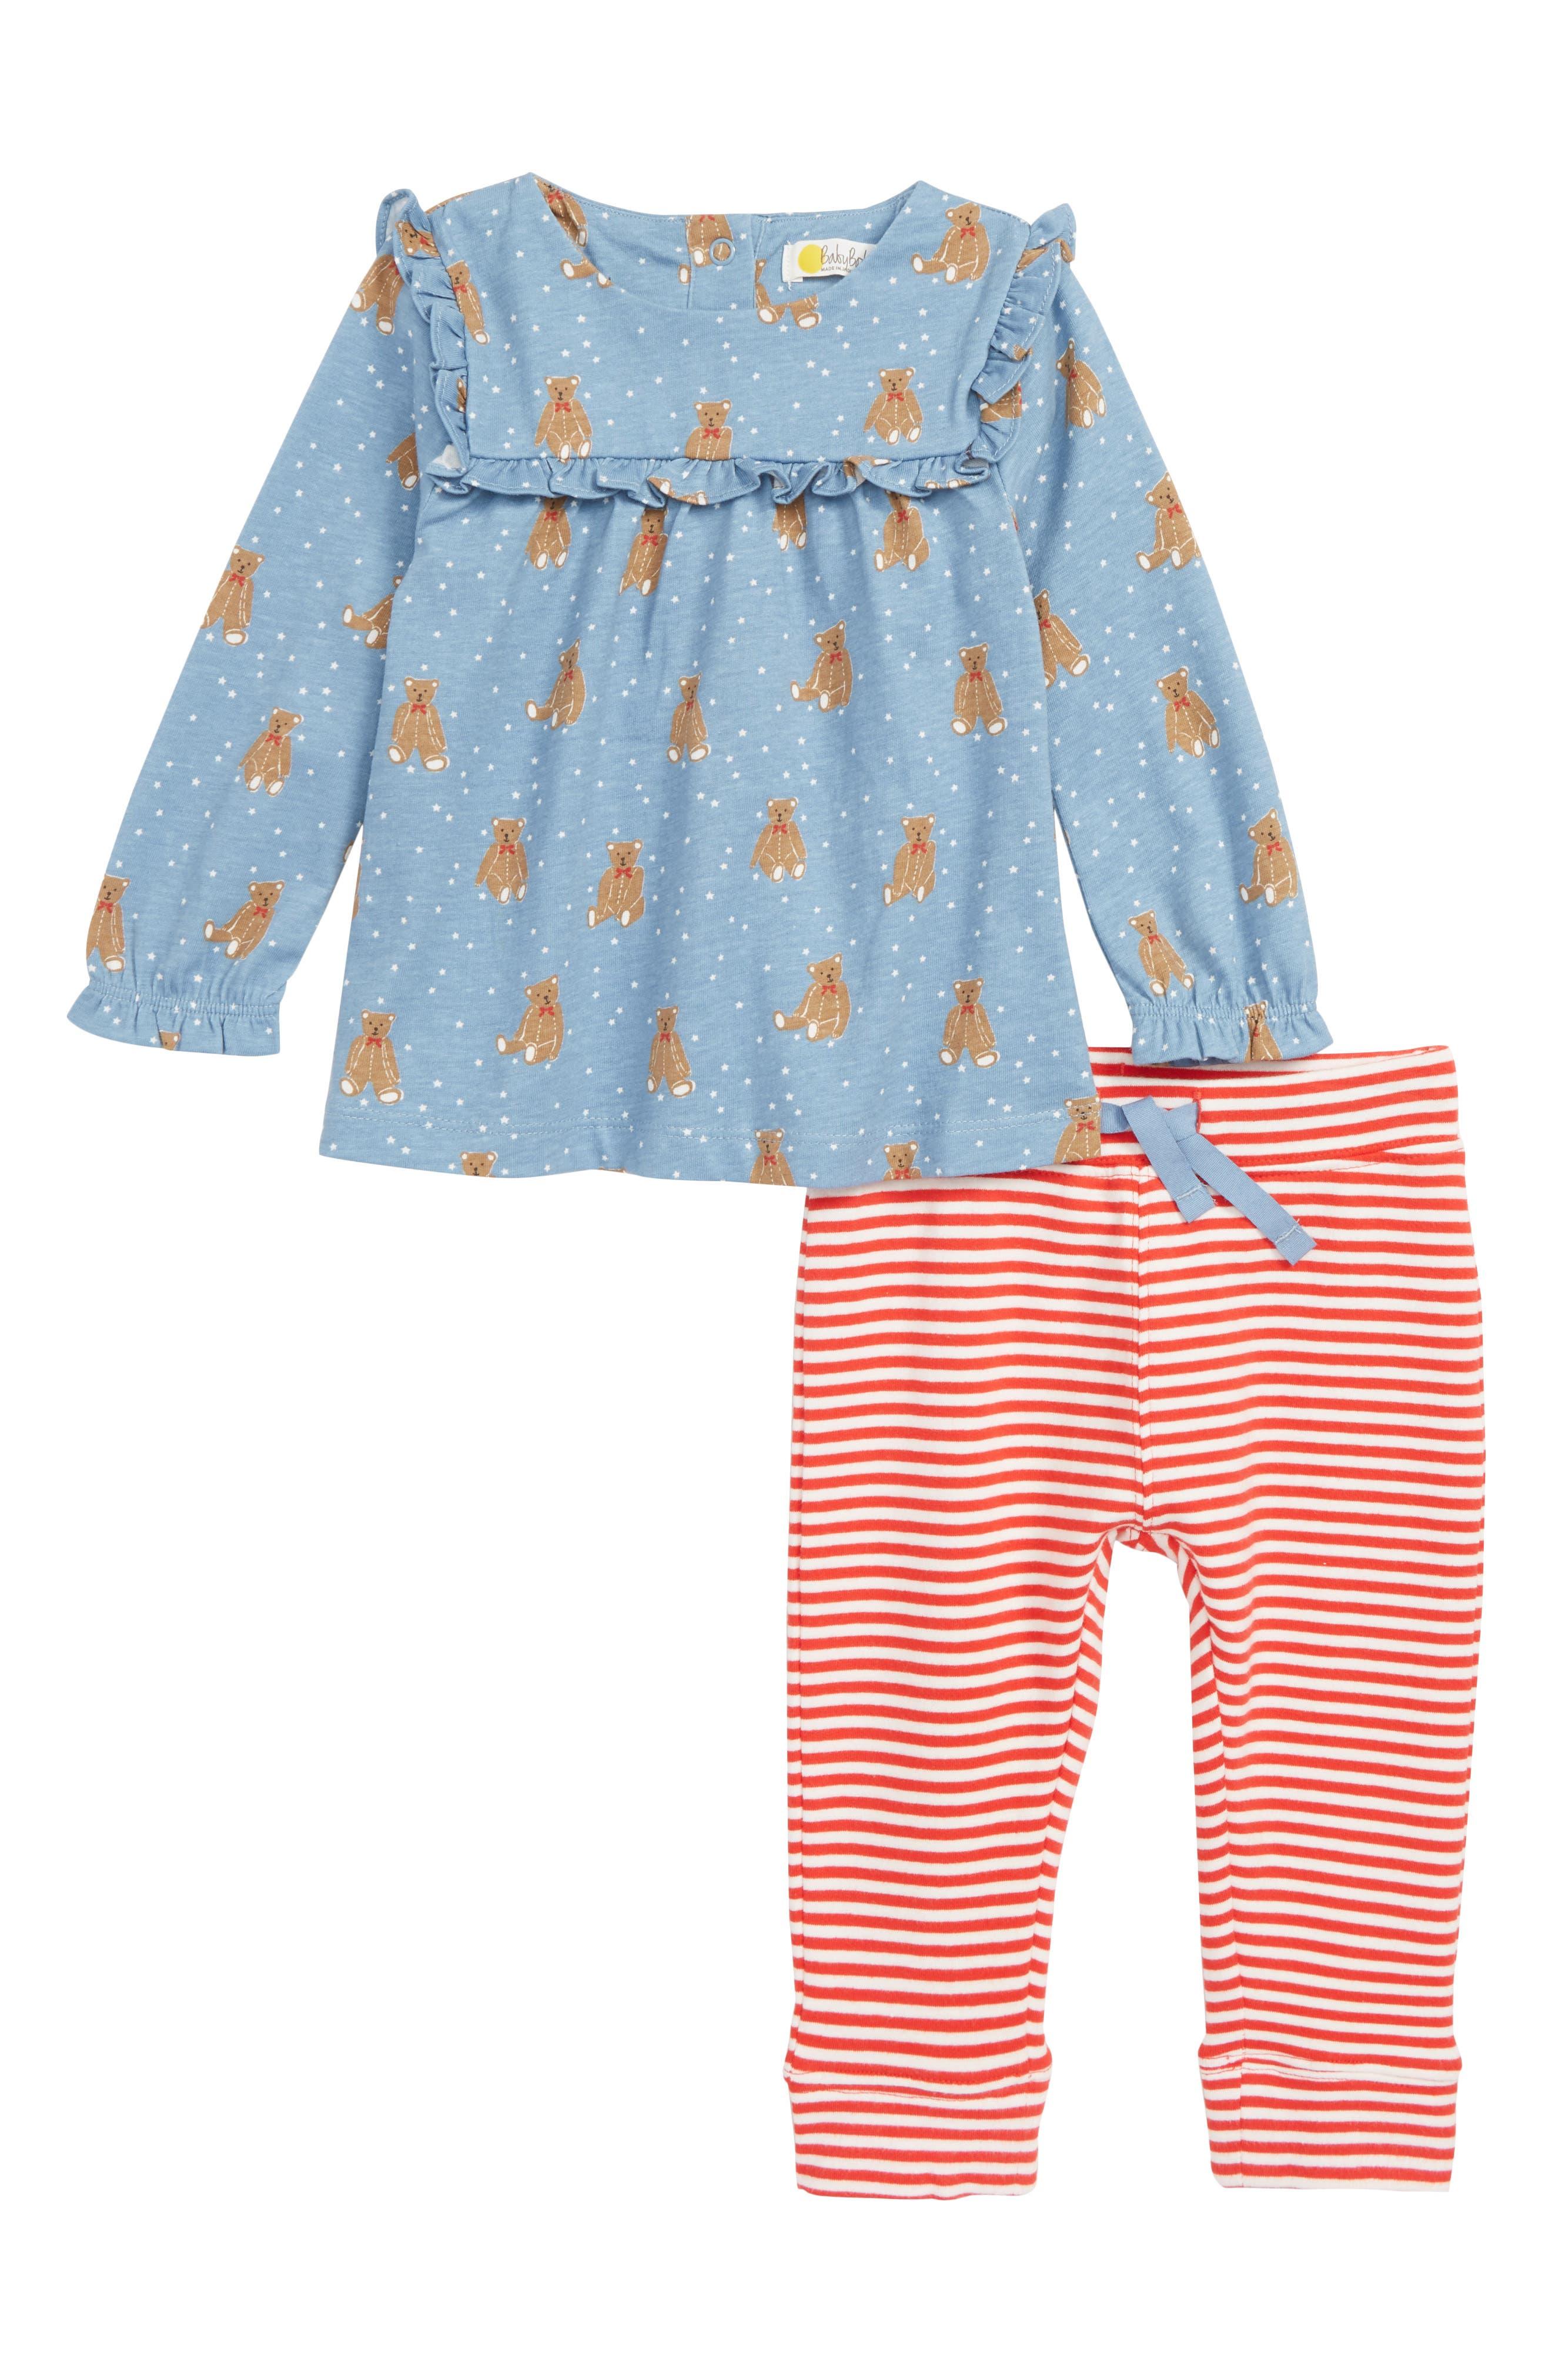 MINI BODEN,                             Boathouse Blue Baby Bars Tunic & Leggings Set,                             Main thumbnail 1, color,                             400